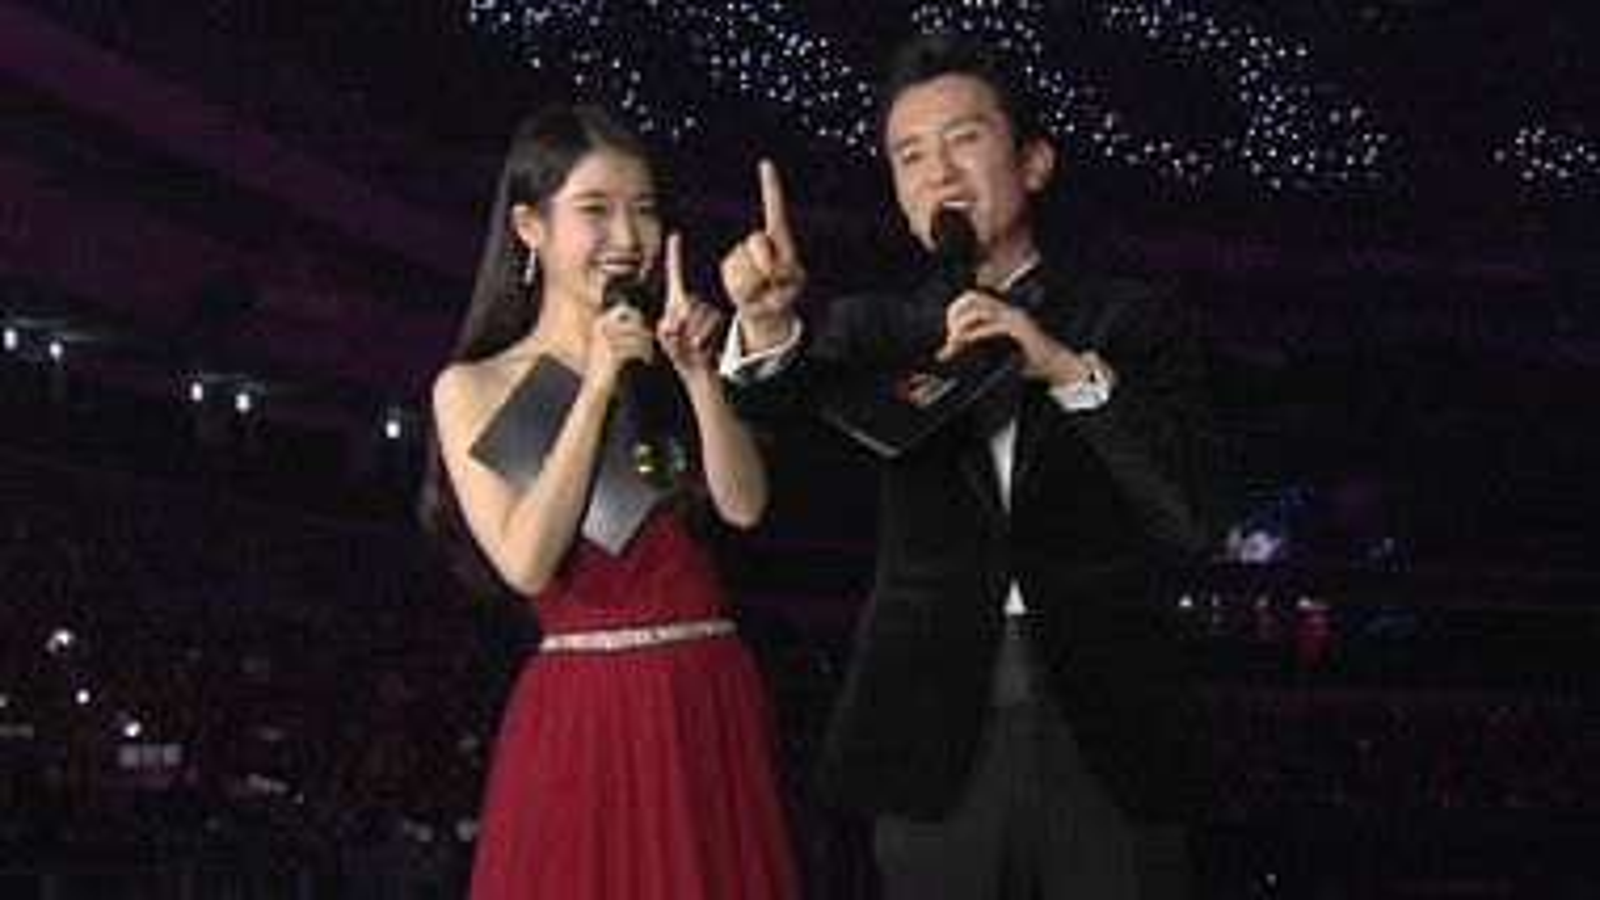 2017 SBS 歌謠大戰音樂成會 (Gayo Daejeon_Music Festival) 第 1集